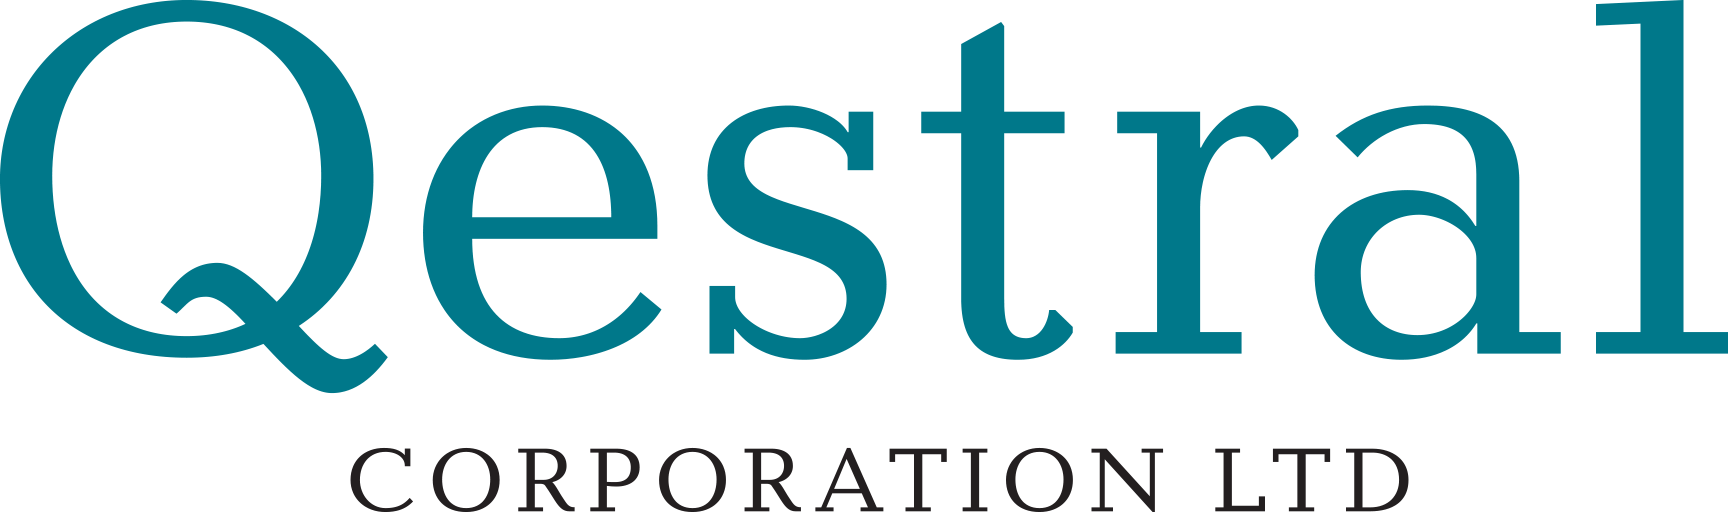 Qestral_Corp_masterlogo.png